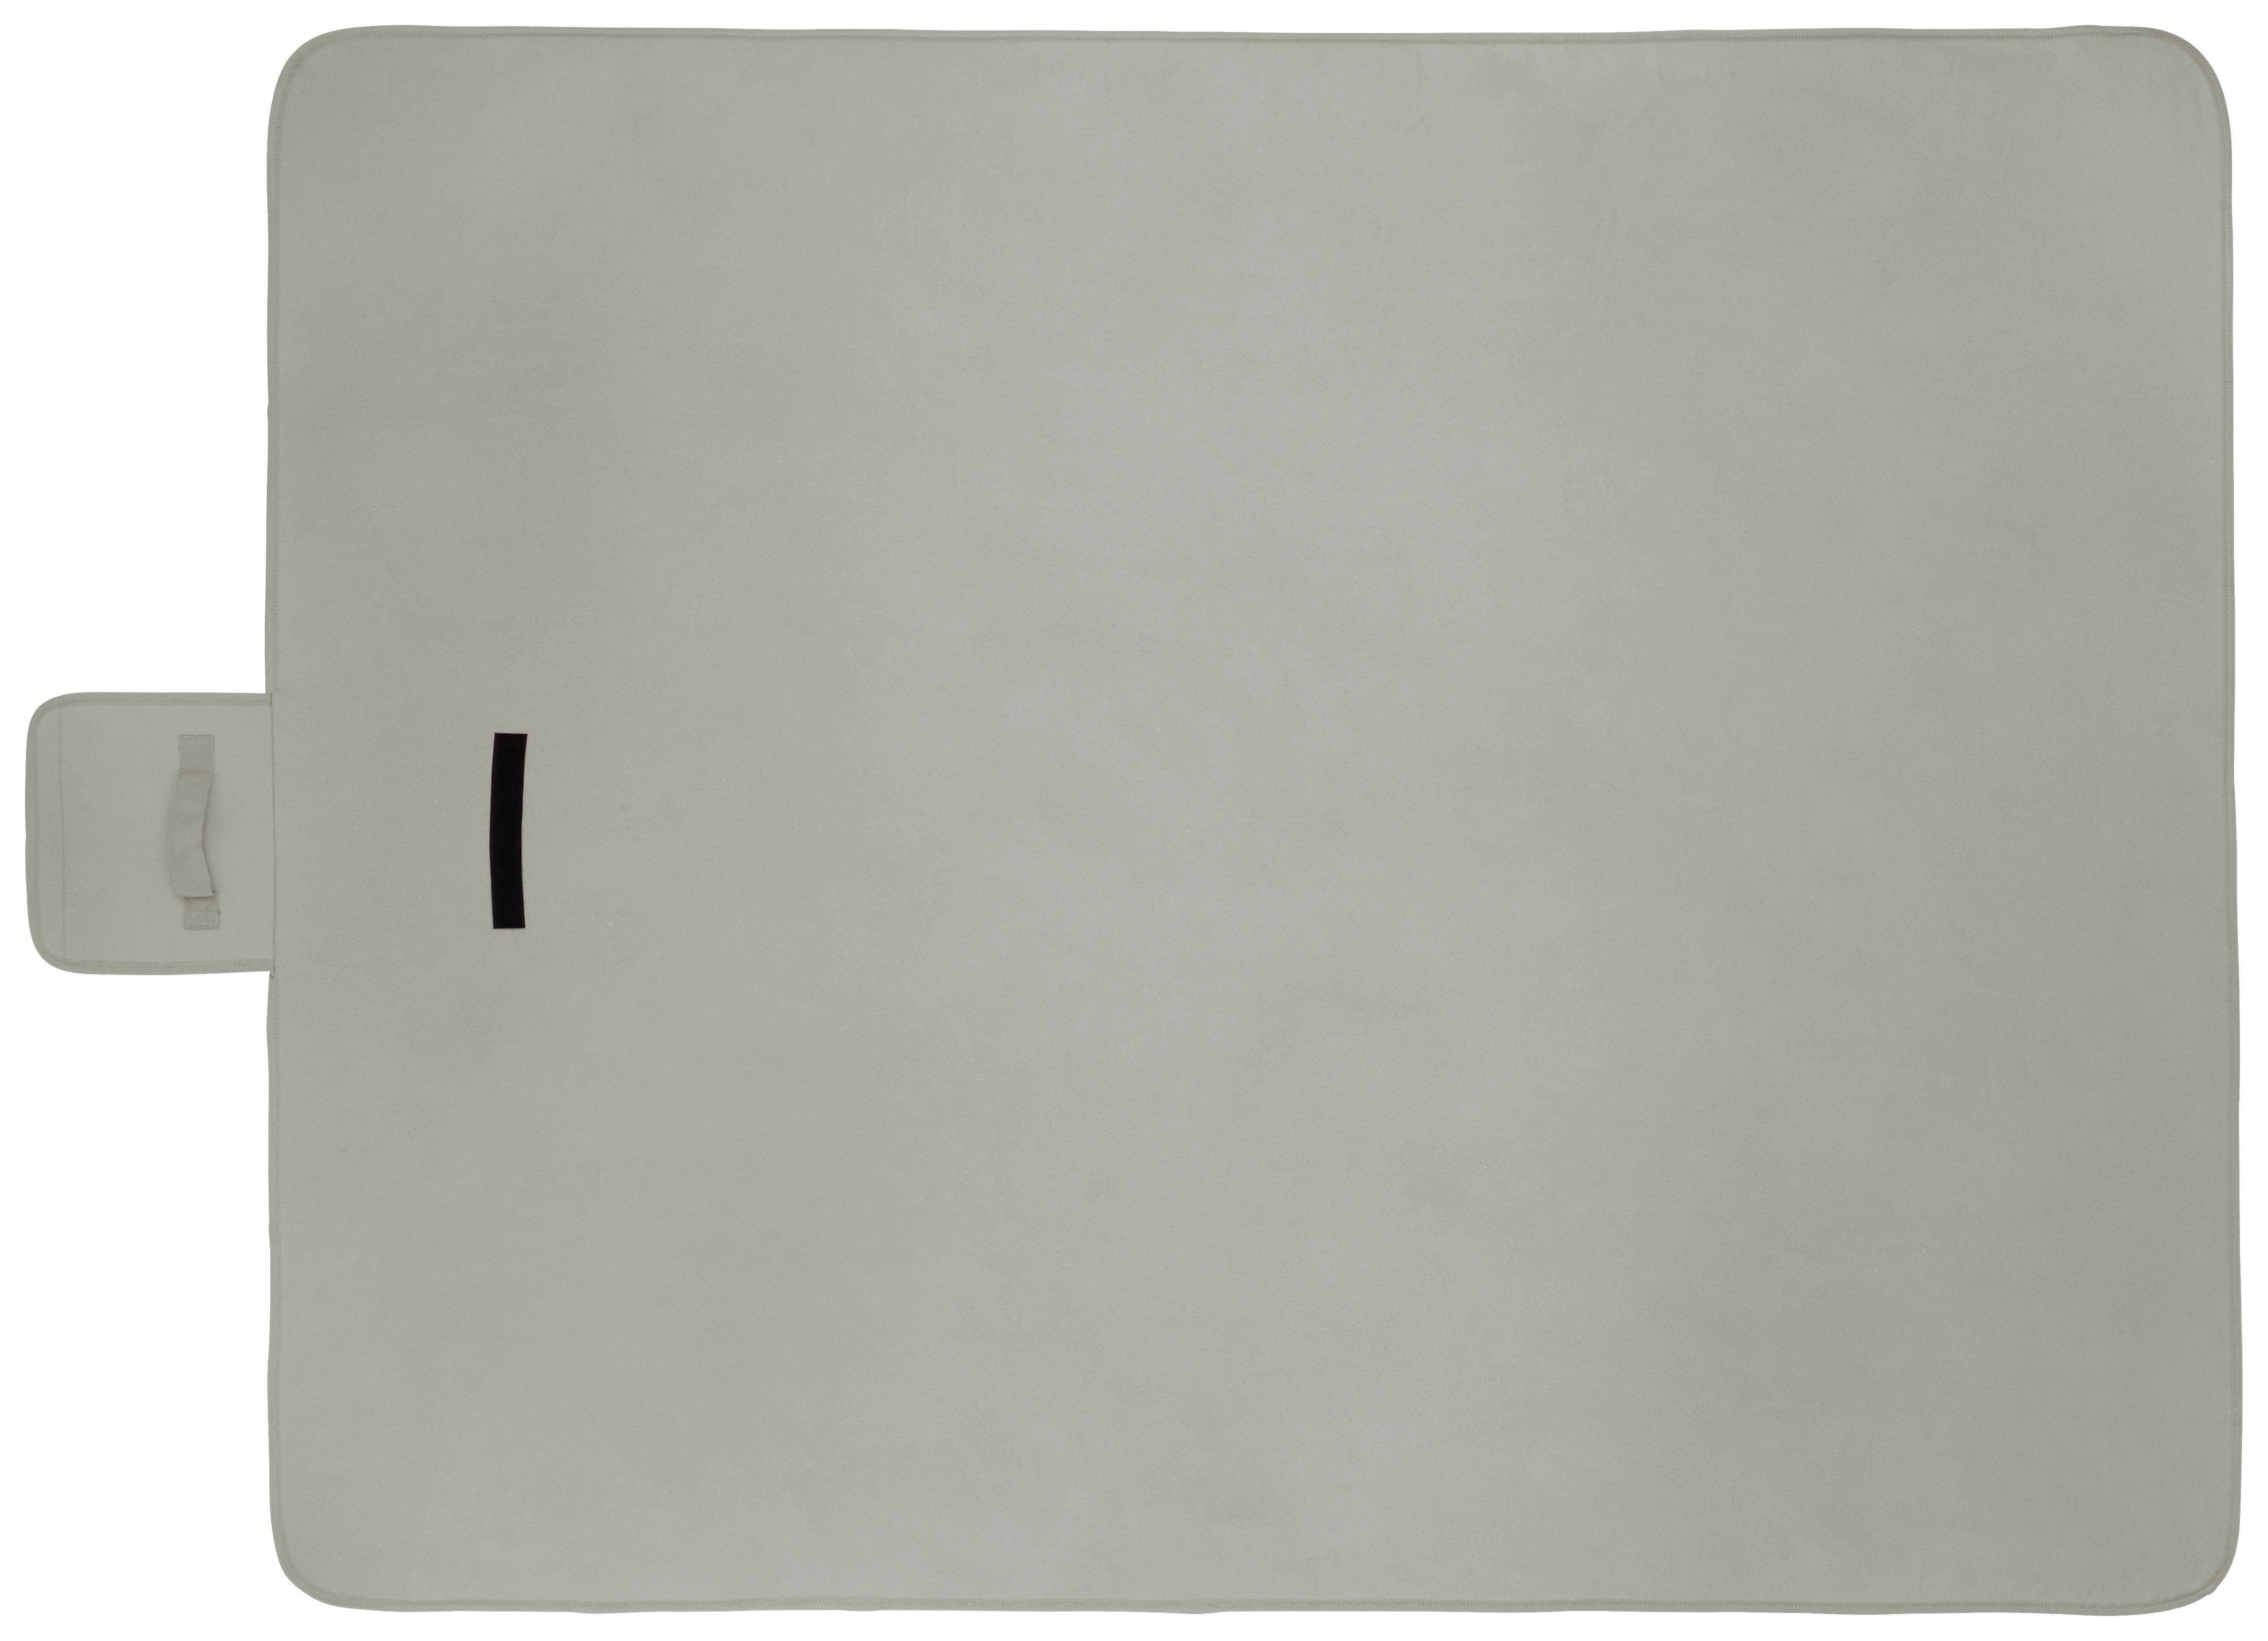 Picknickdecke Uni in Grau, ca. 125x150cm - Grau, Textil (125/150cm) - MÖMAX modern living